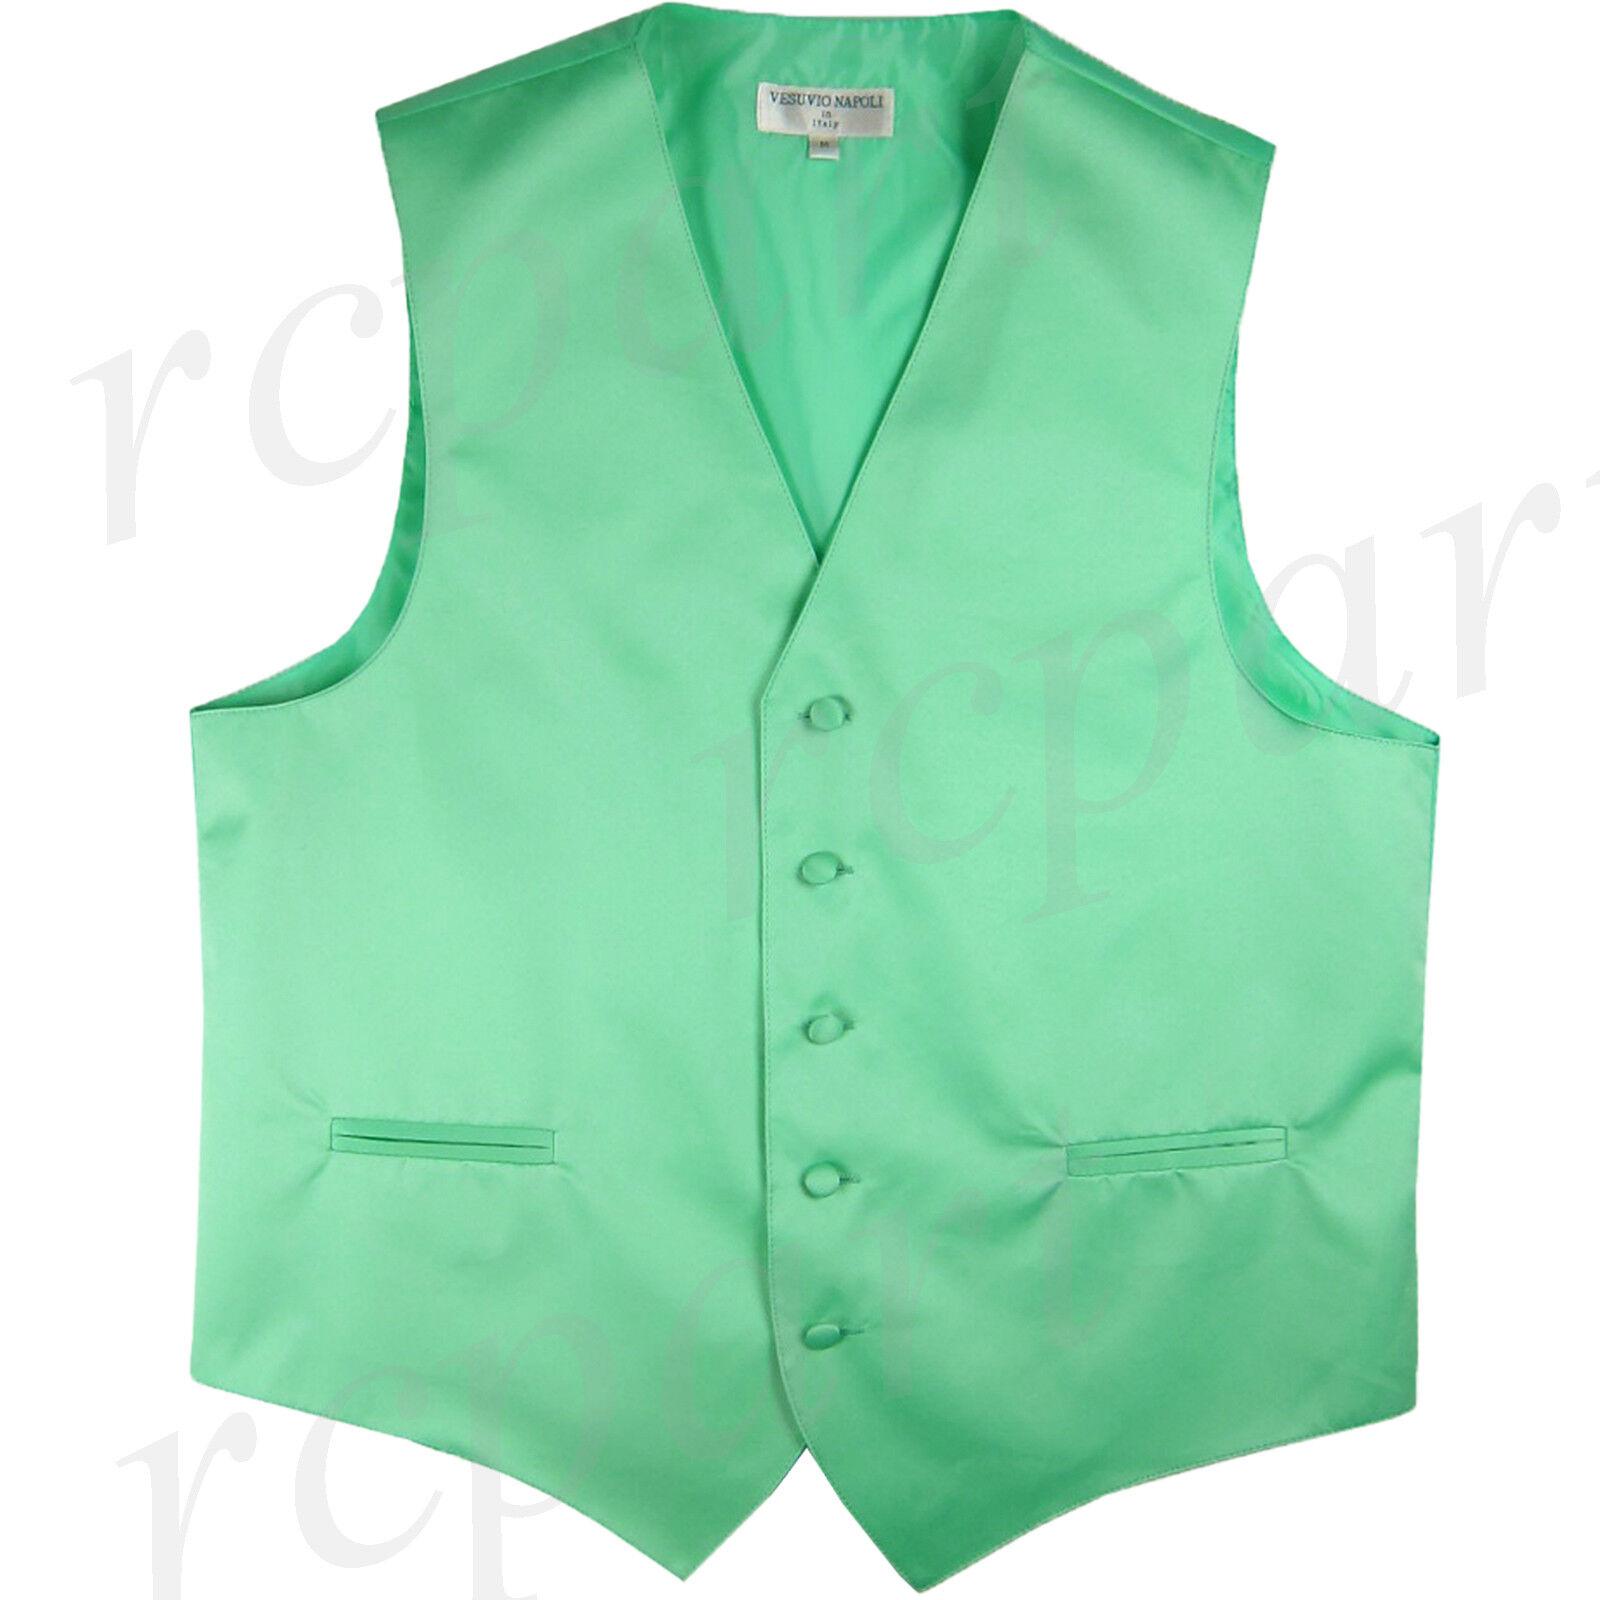 New Men's Vesuvio Napoli Tuxedo Vest Waistcoat only wedding Aqua green 5XL 6XL